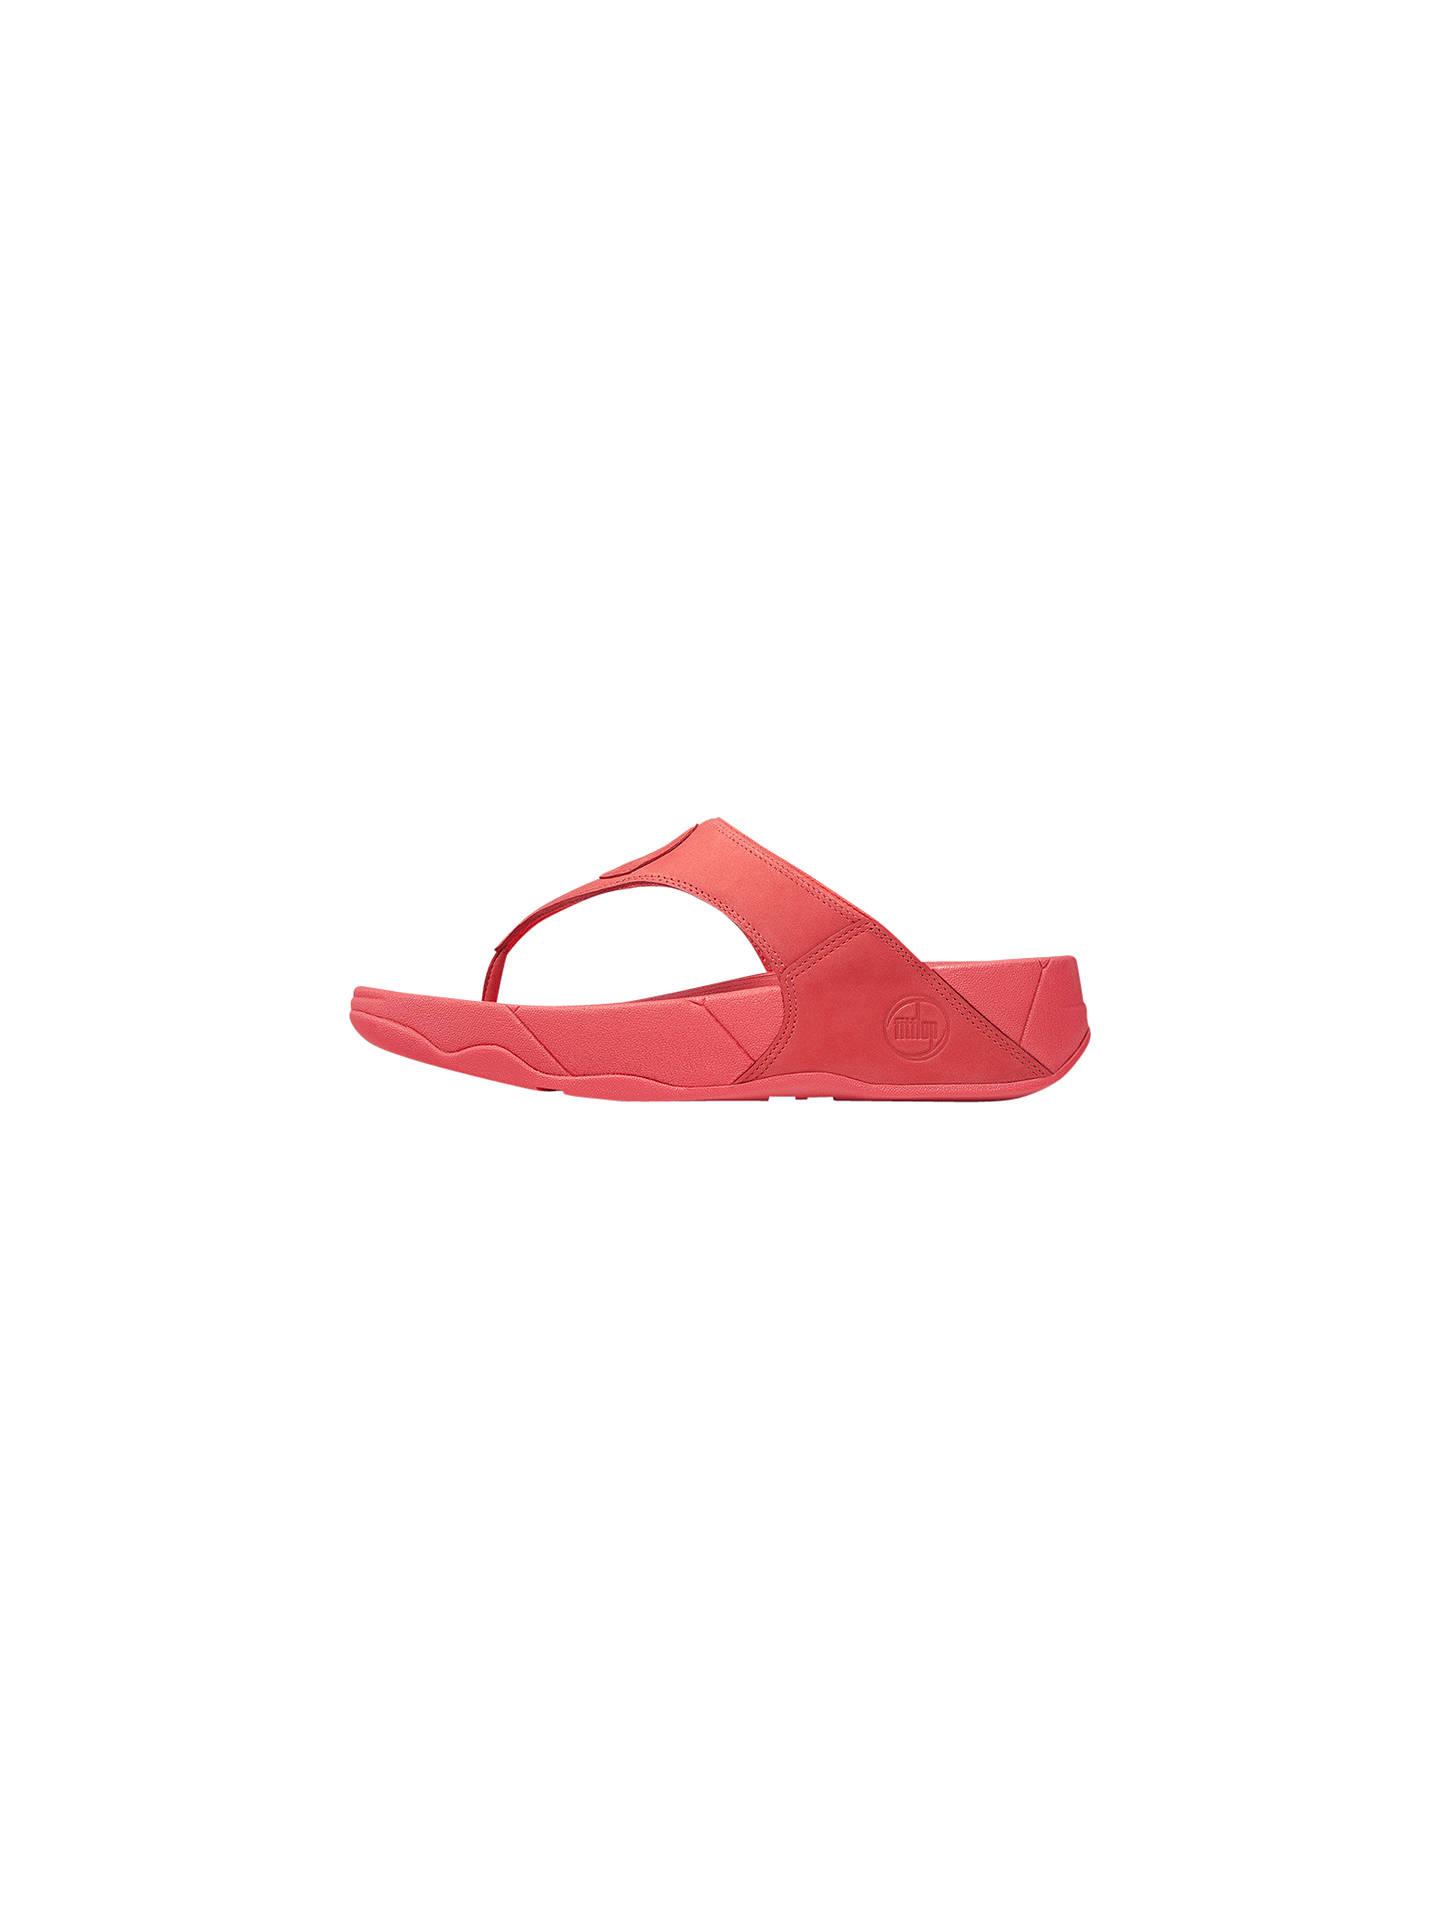 bbf1f3ca0896 Buy FitFlop Women s Walkstar 3 Nubuck Sandals